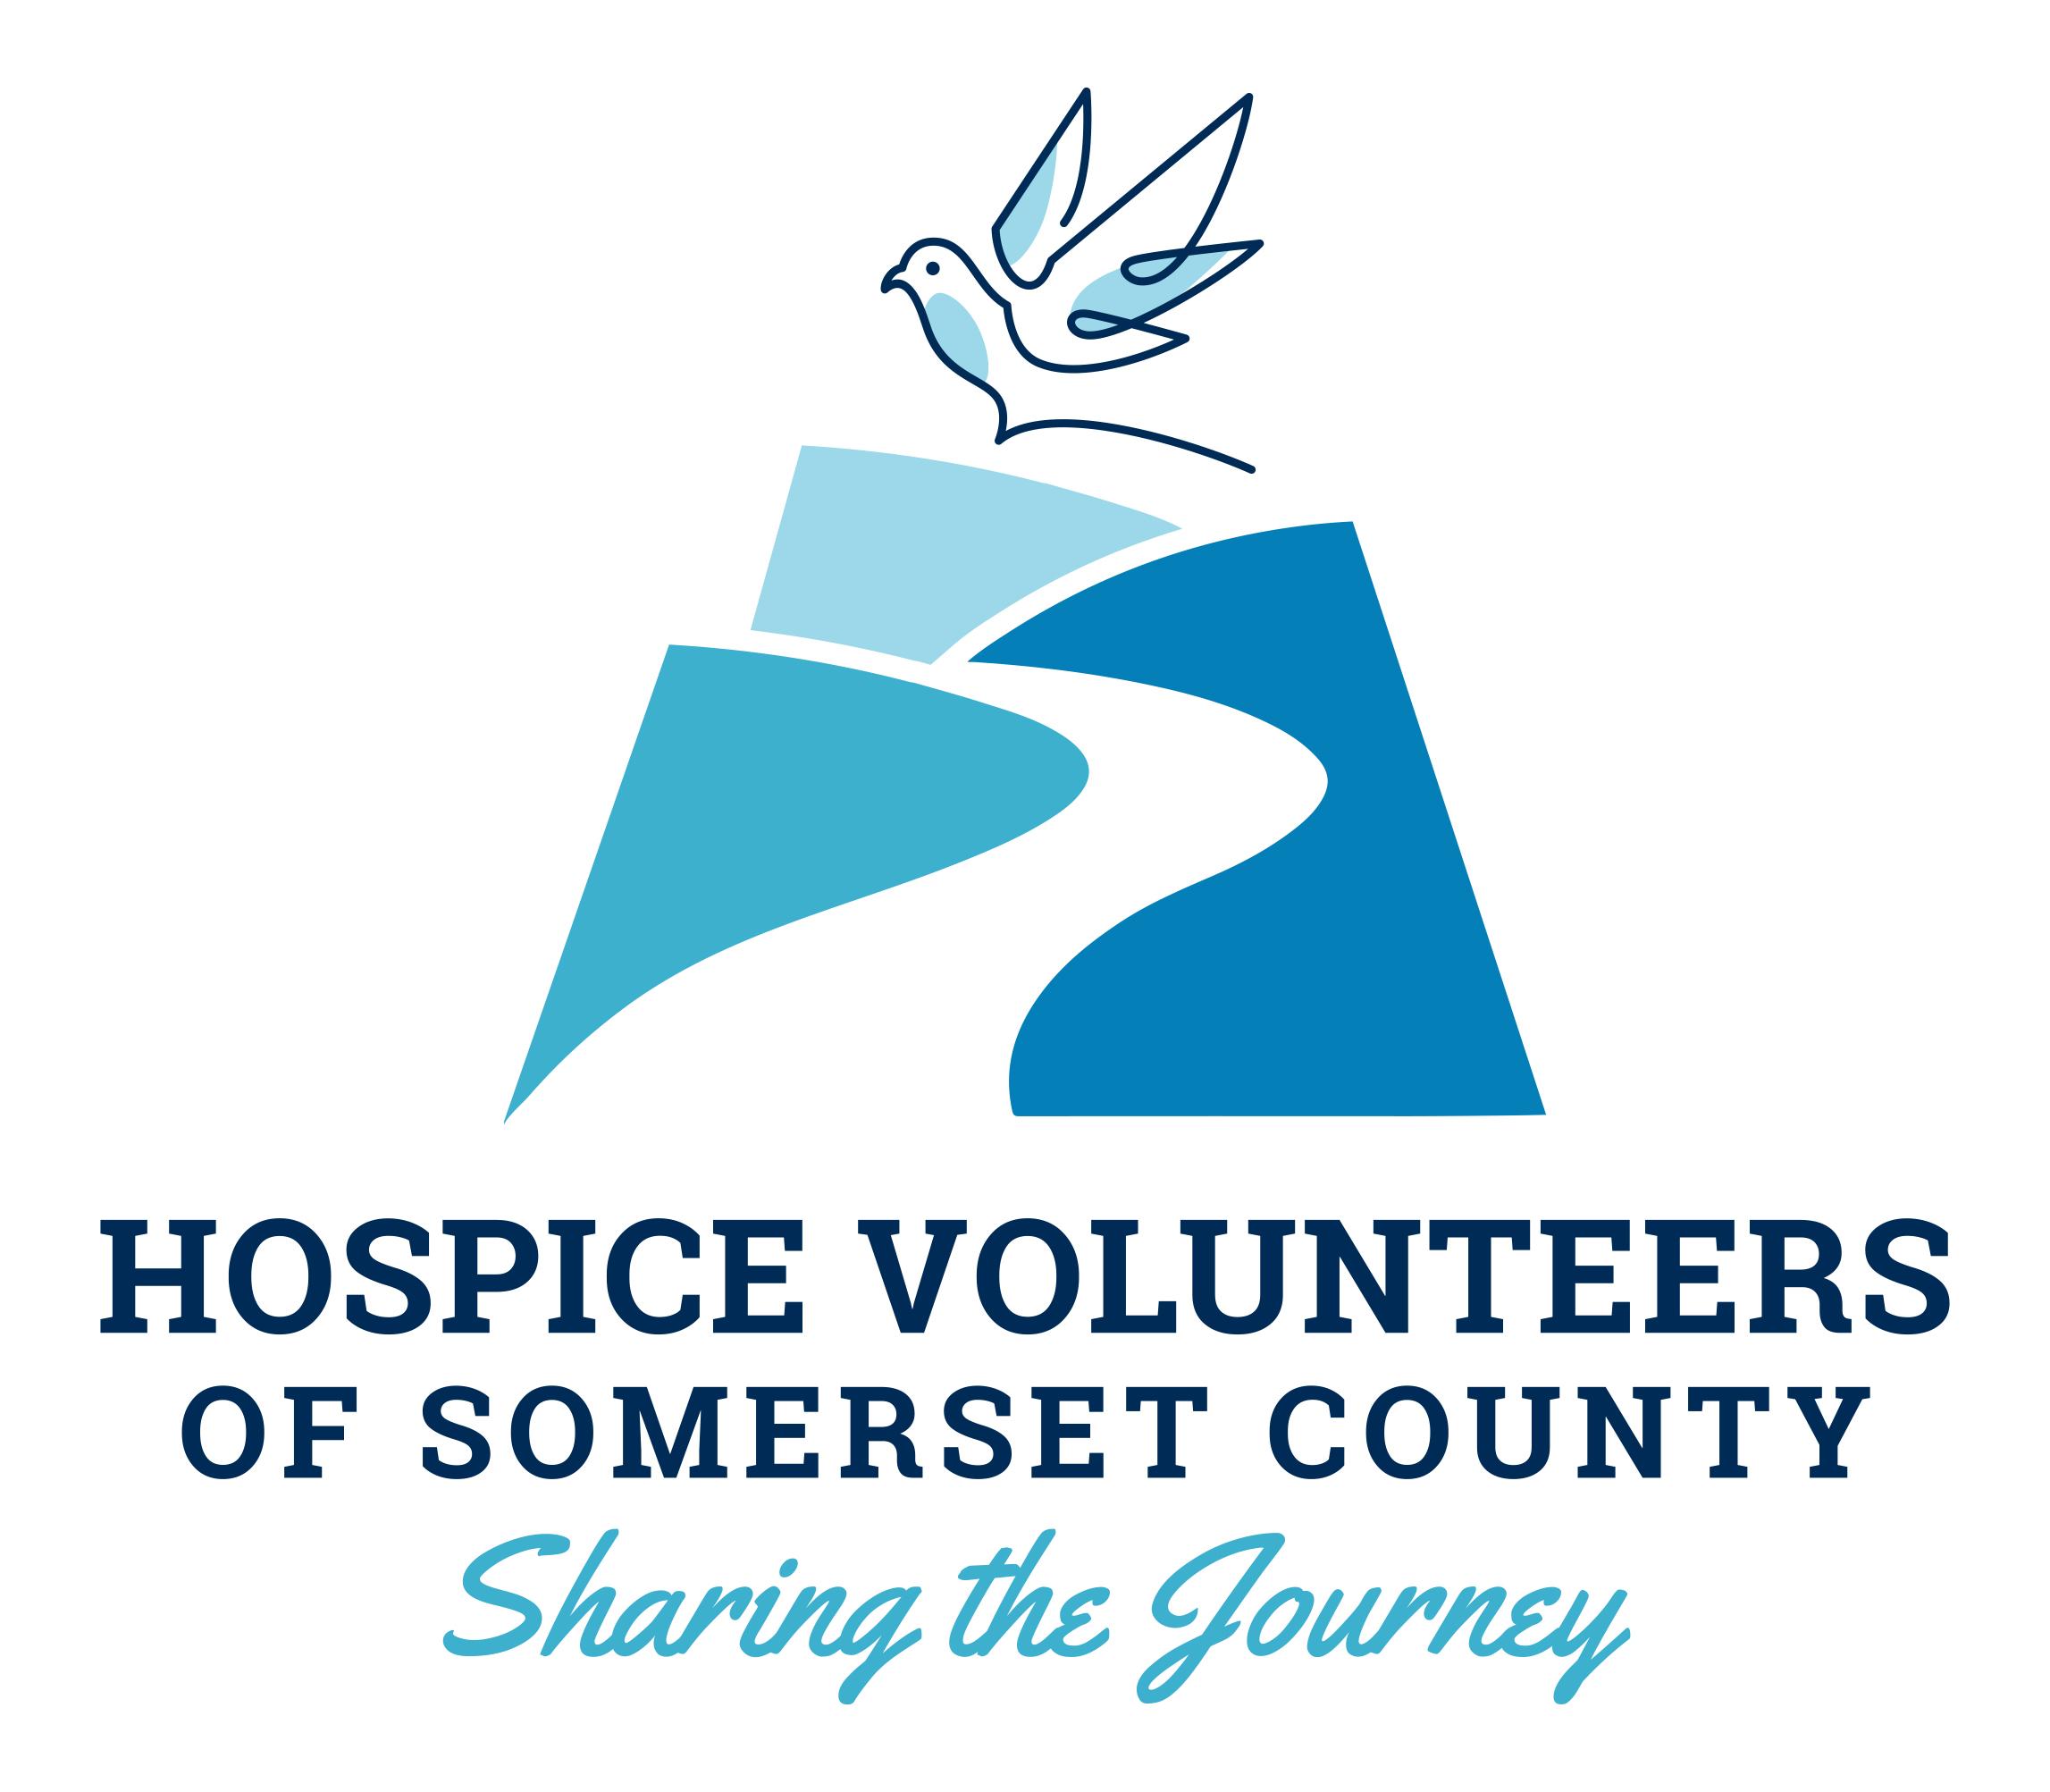 Hospice Volunteers of Somerset County